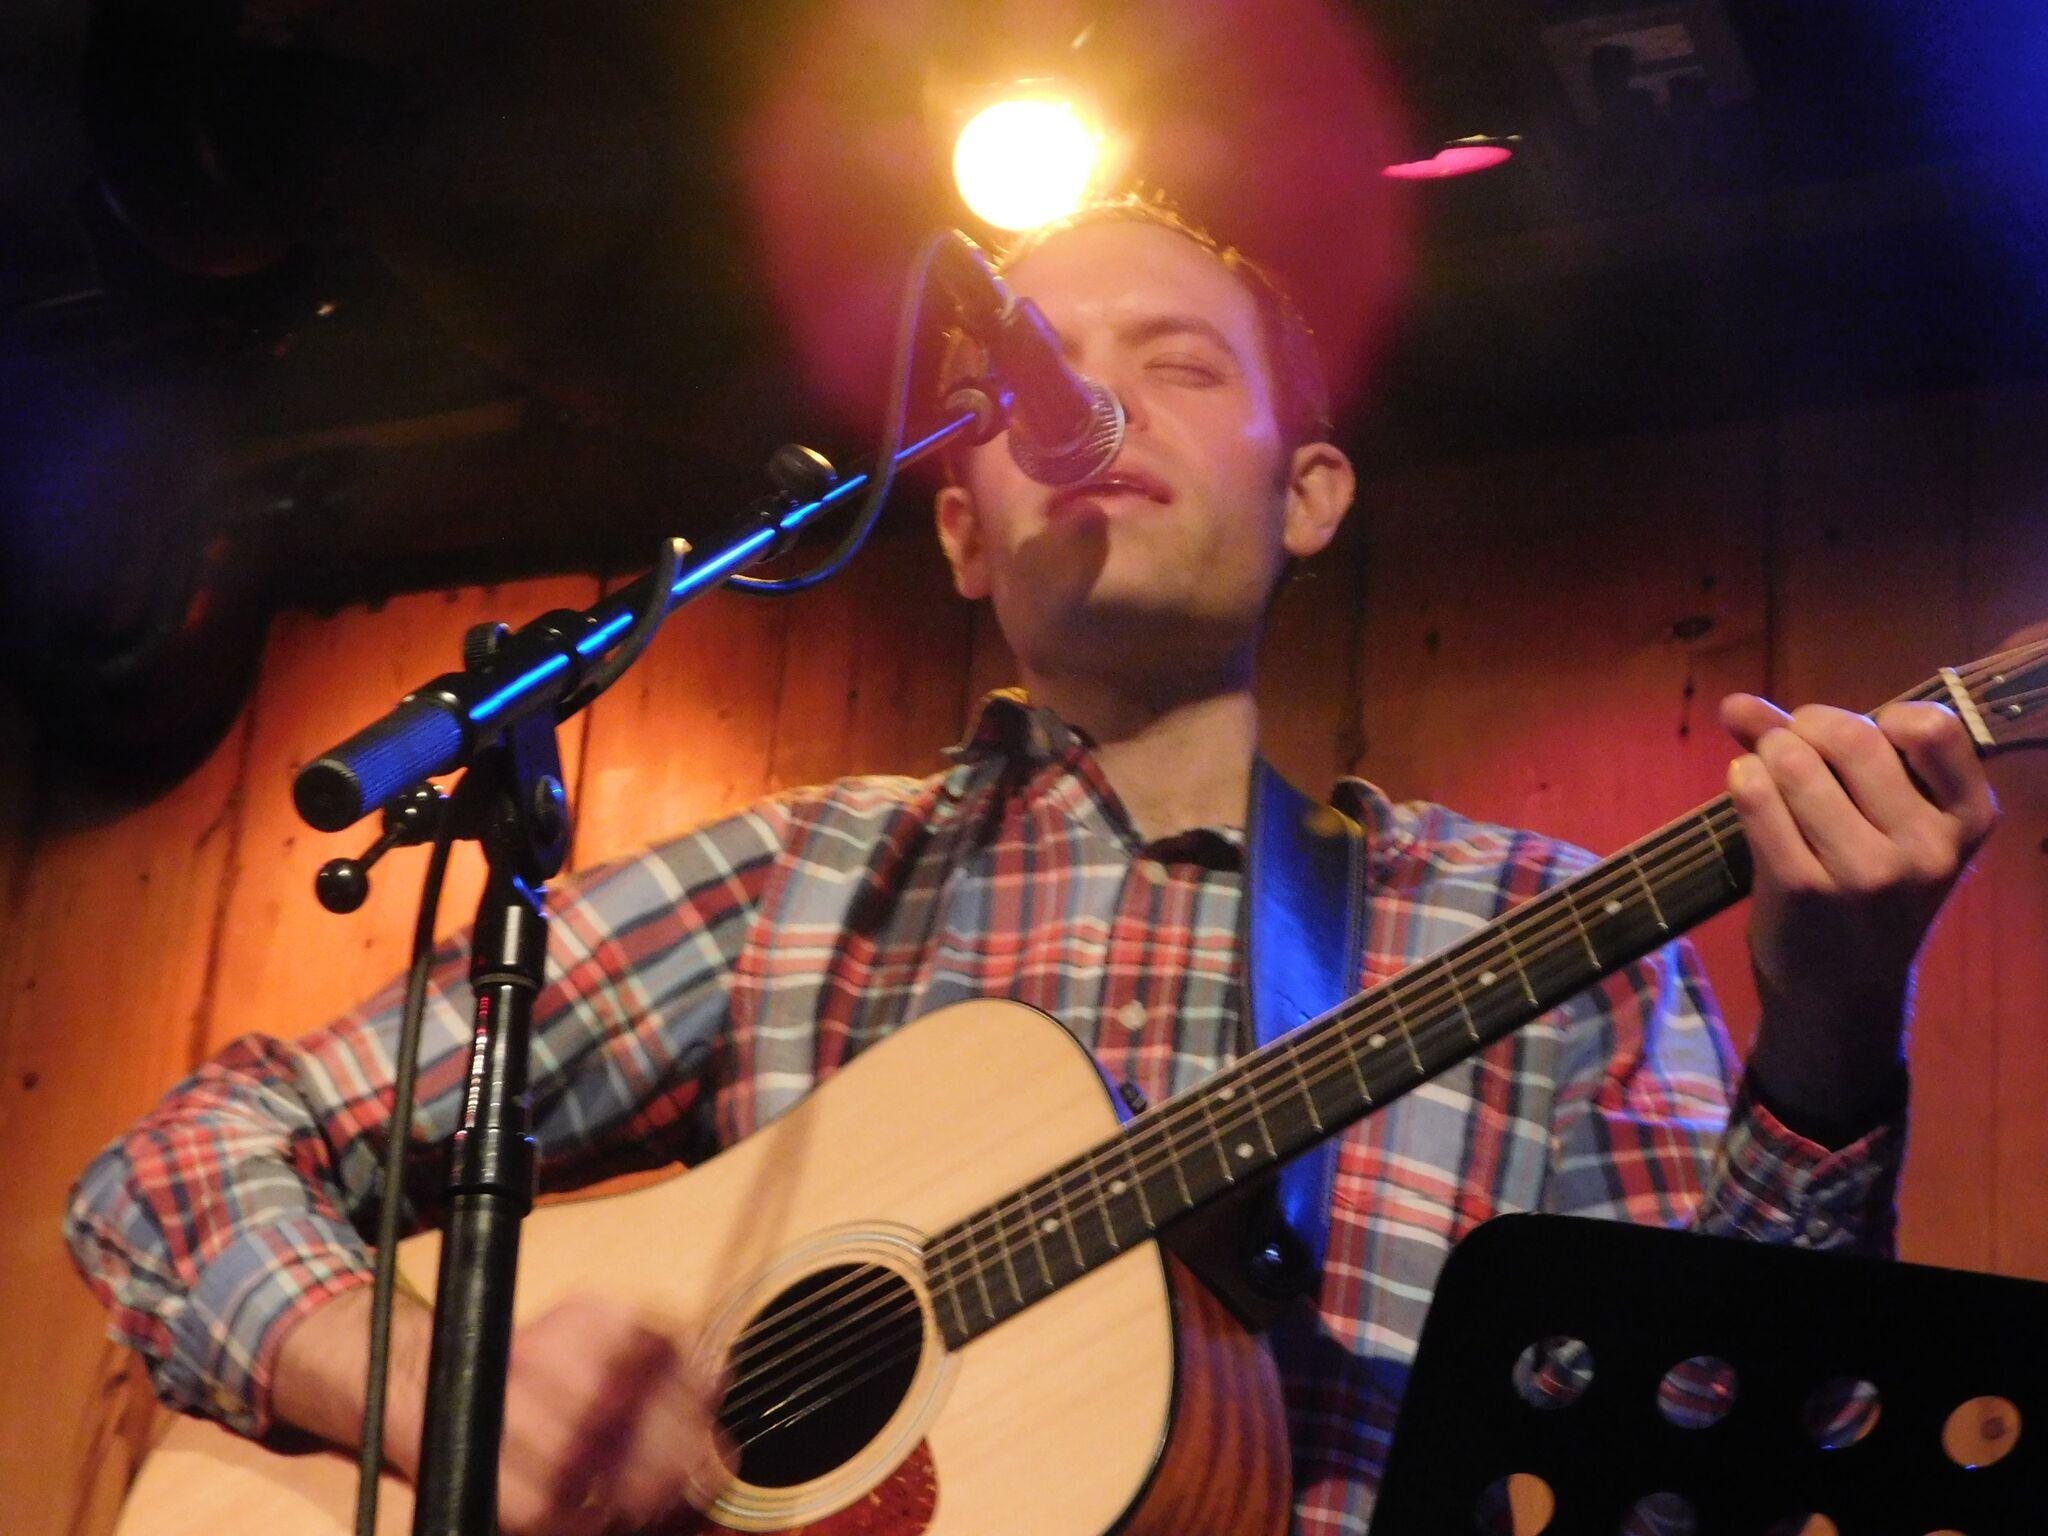 Allen at Rockwood Music Hall